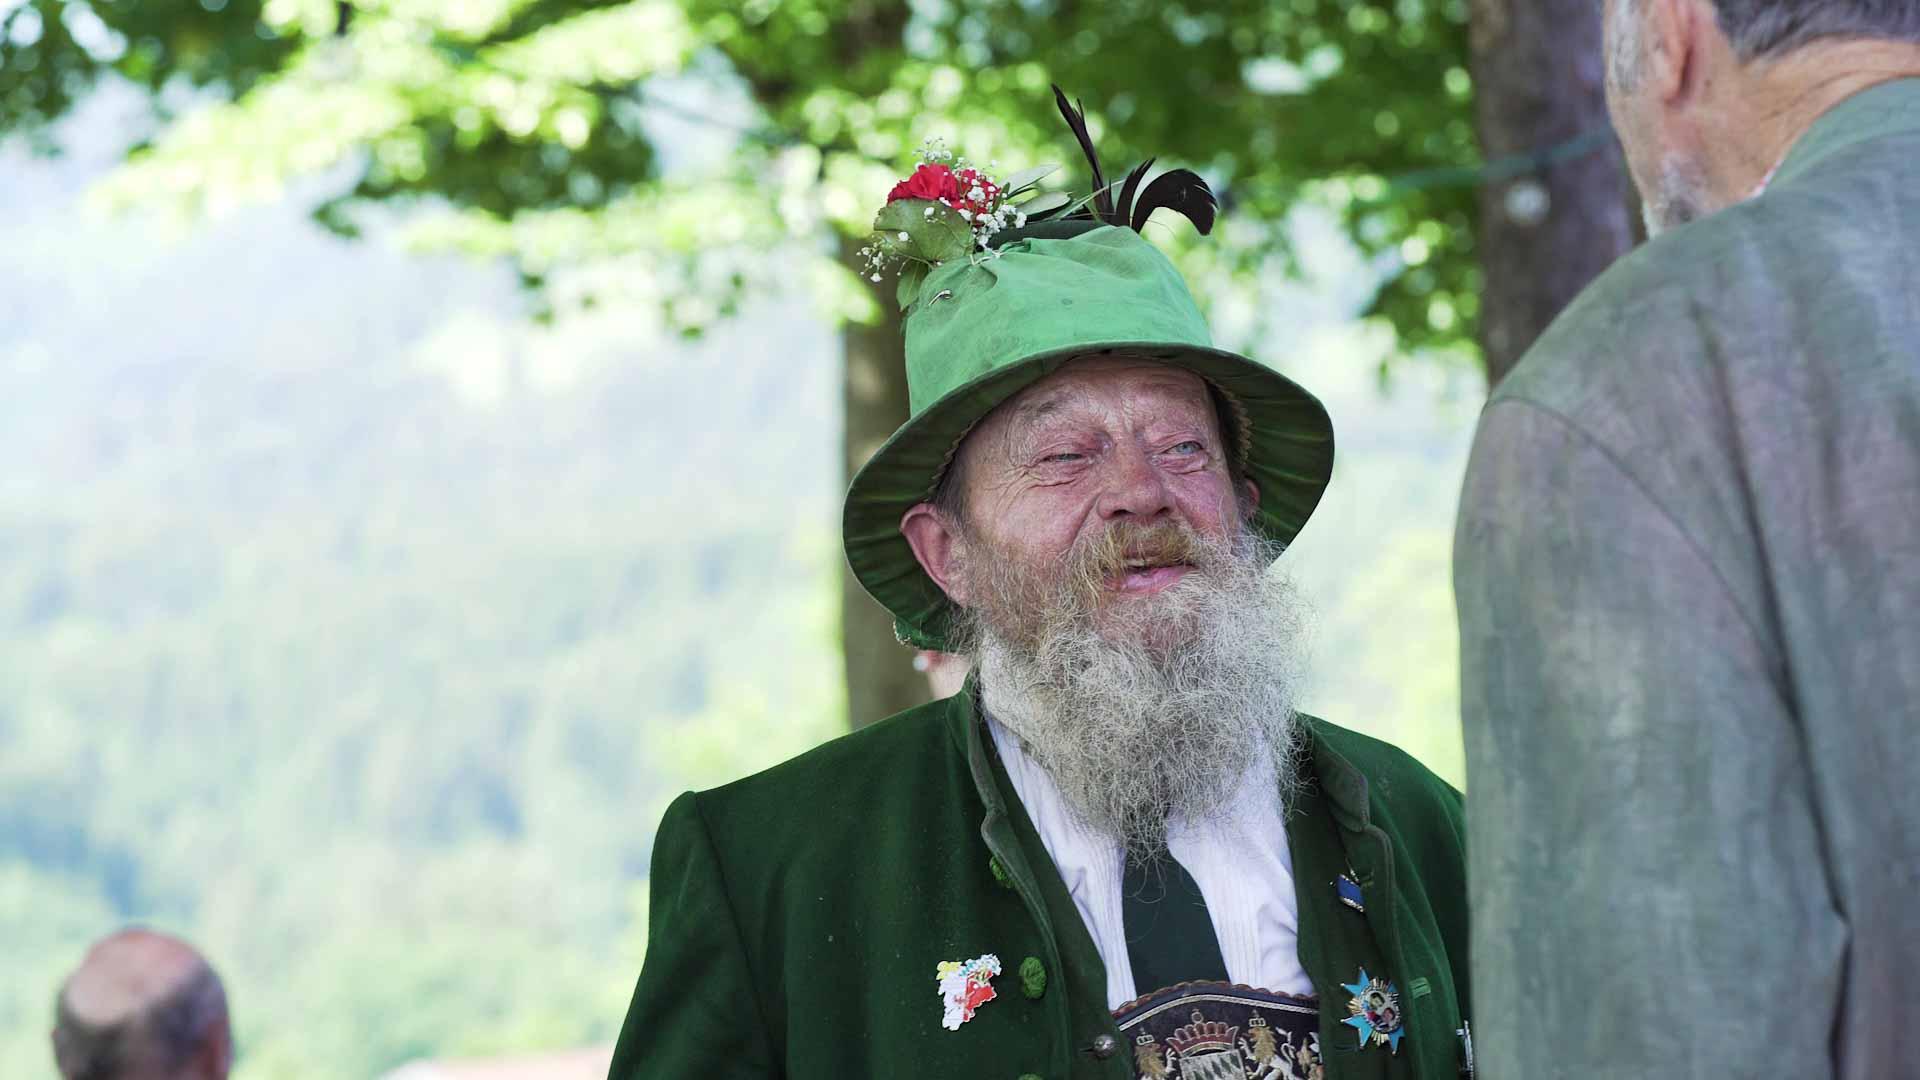 Imagefilm des Altwirt in Wackersberg